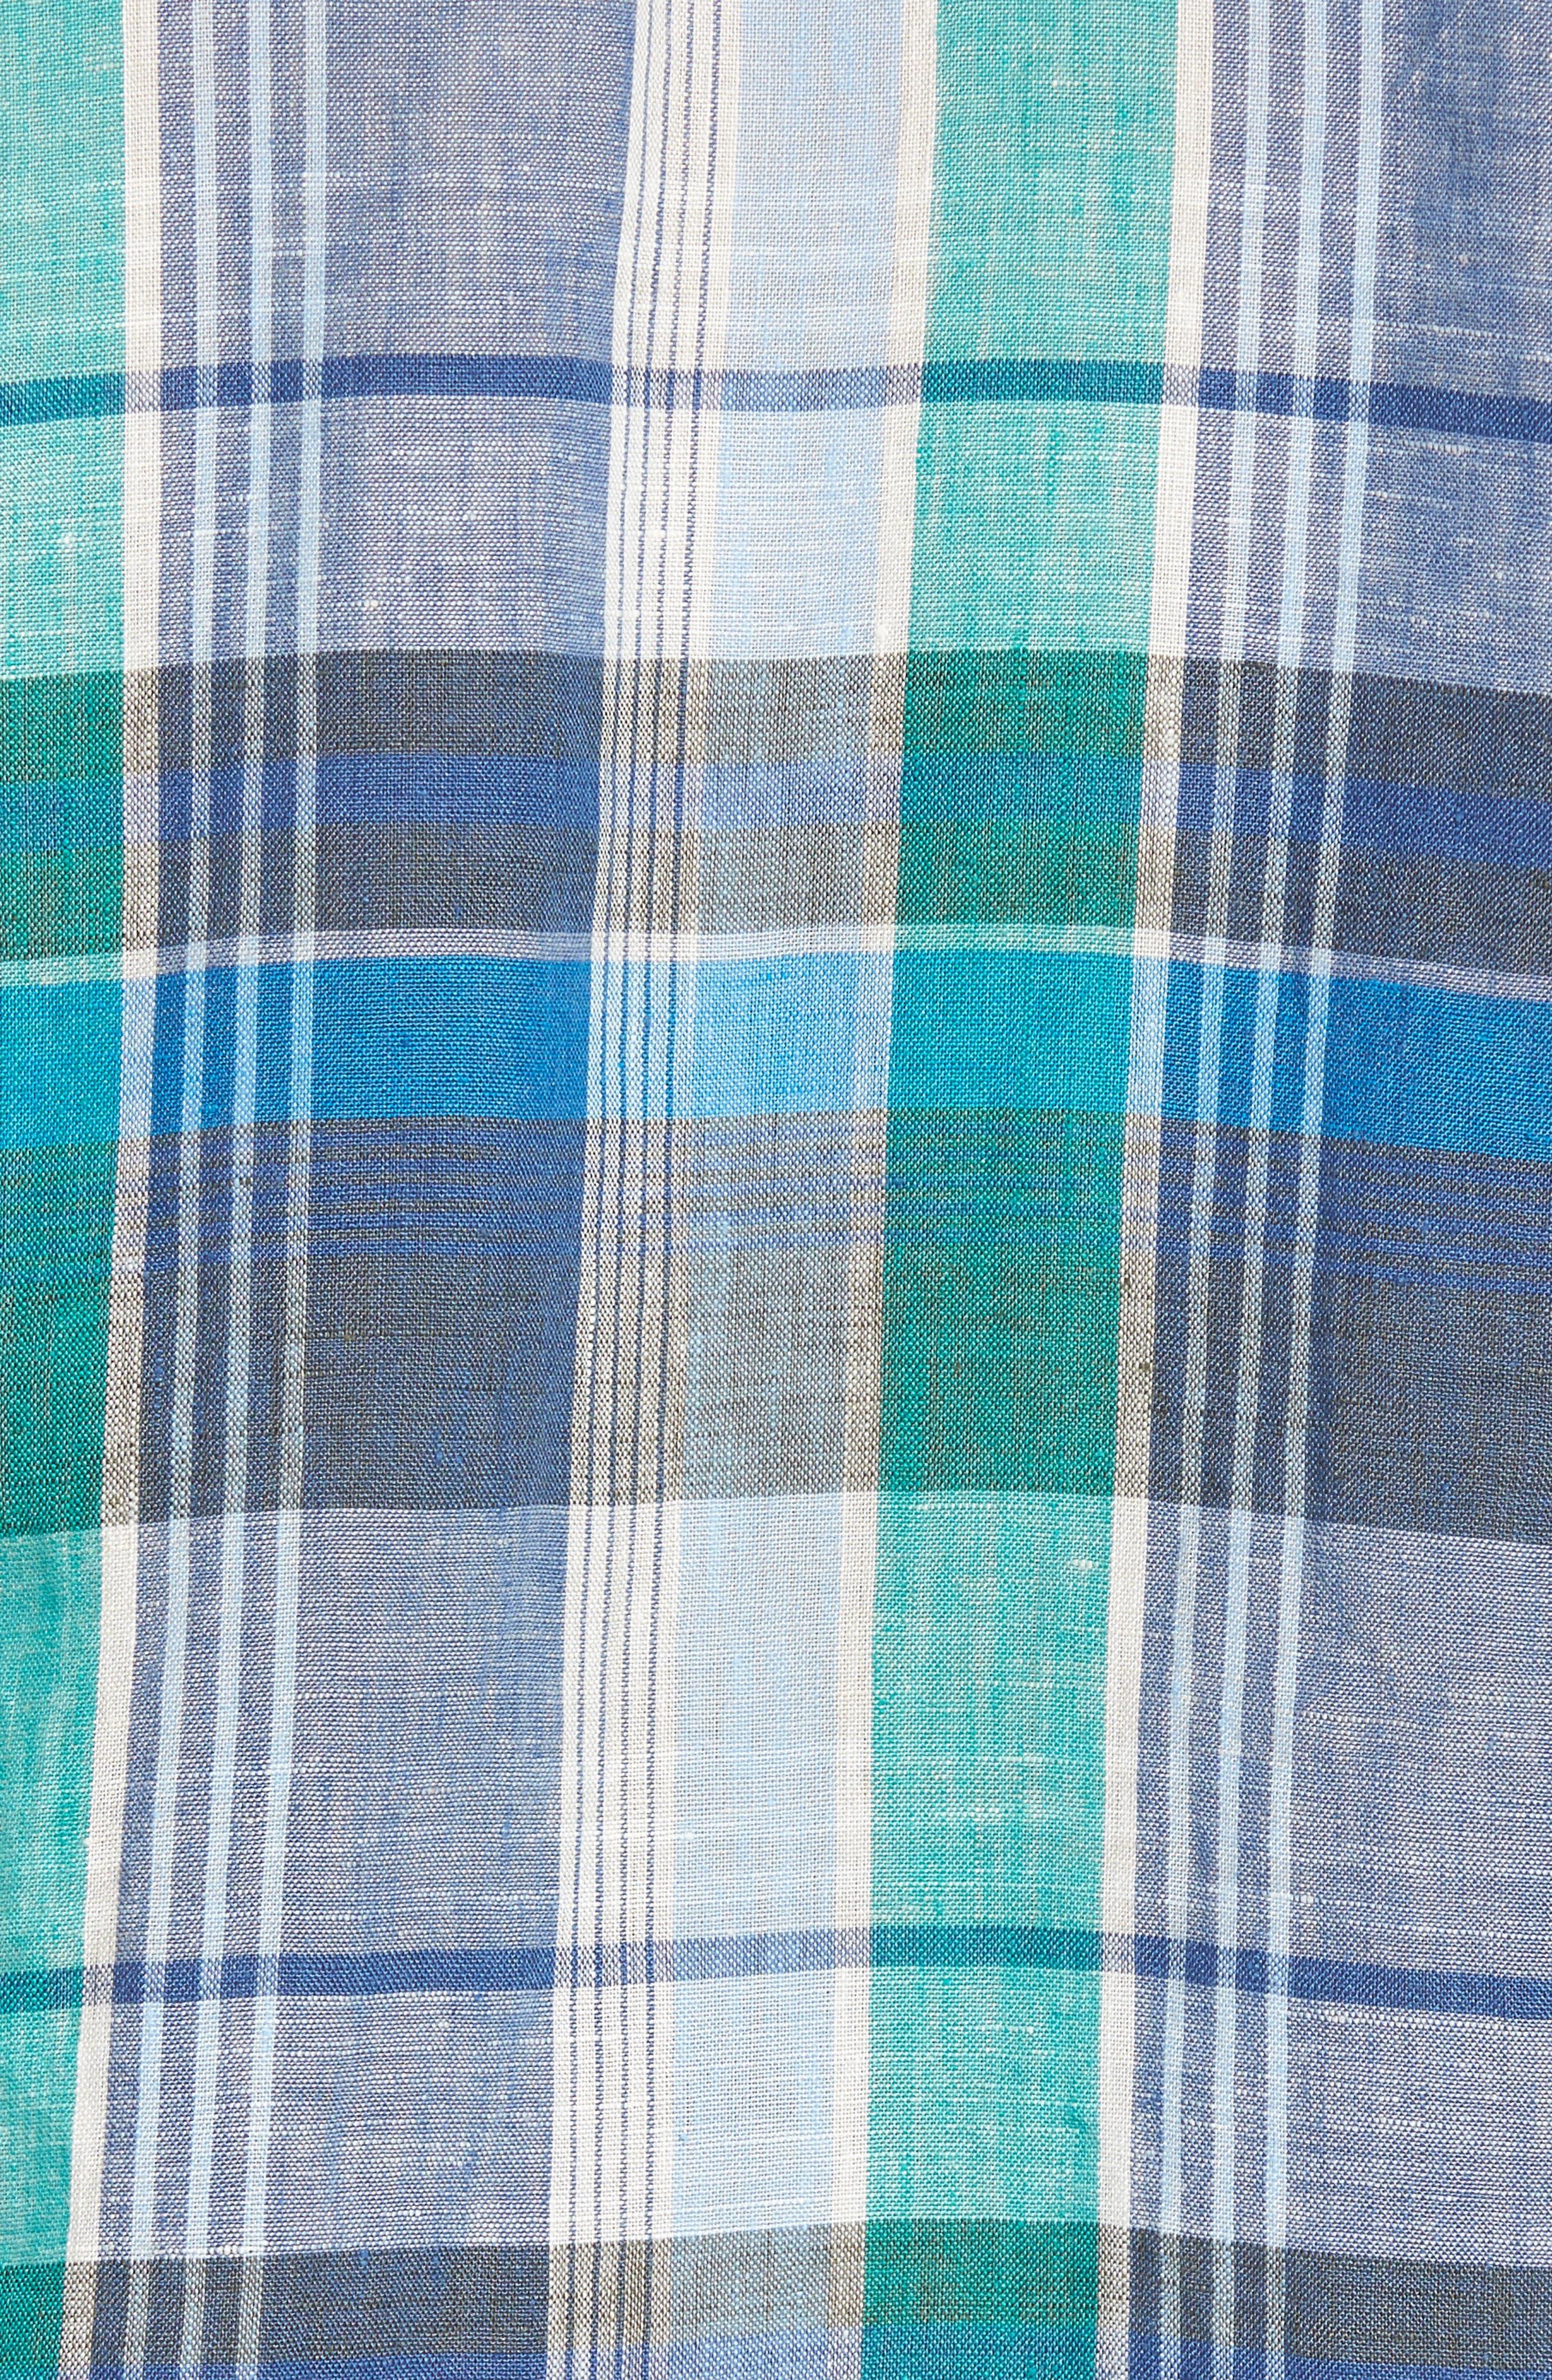 TOMMY BAHAMA,                             Vero Beach Madras Plaid Linen Sport Shirt,                             Alternate thumbnail 5, color,                             300